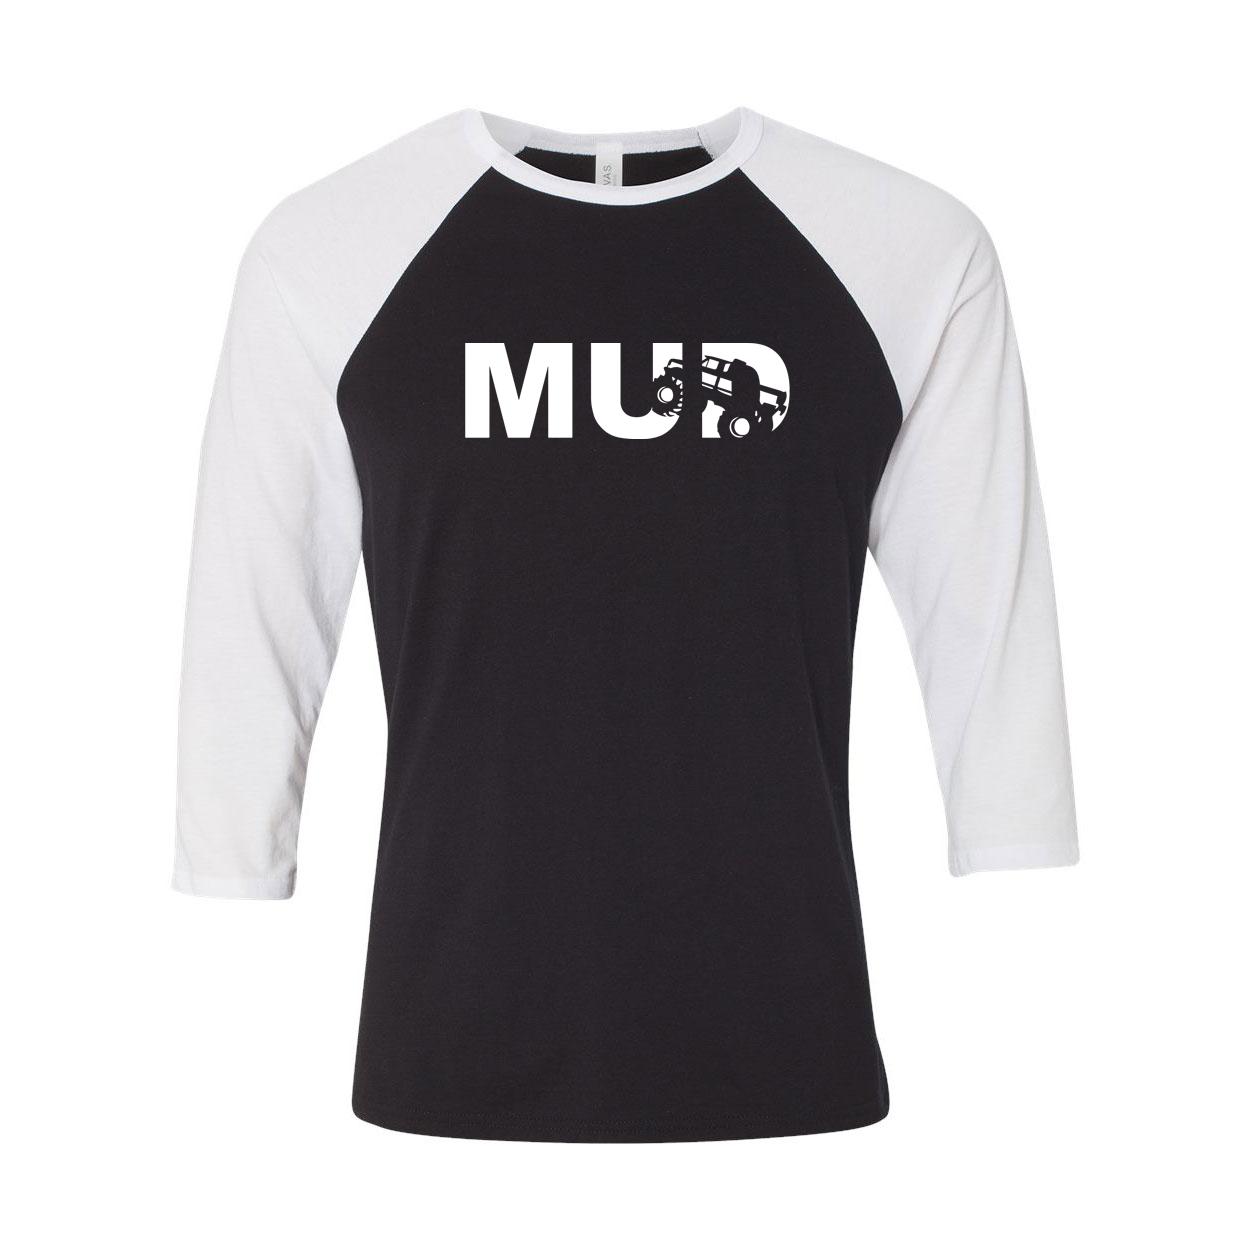 Mud Truck Logo Classic Raglan Shirt Black/White (White Logo)